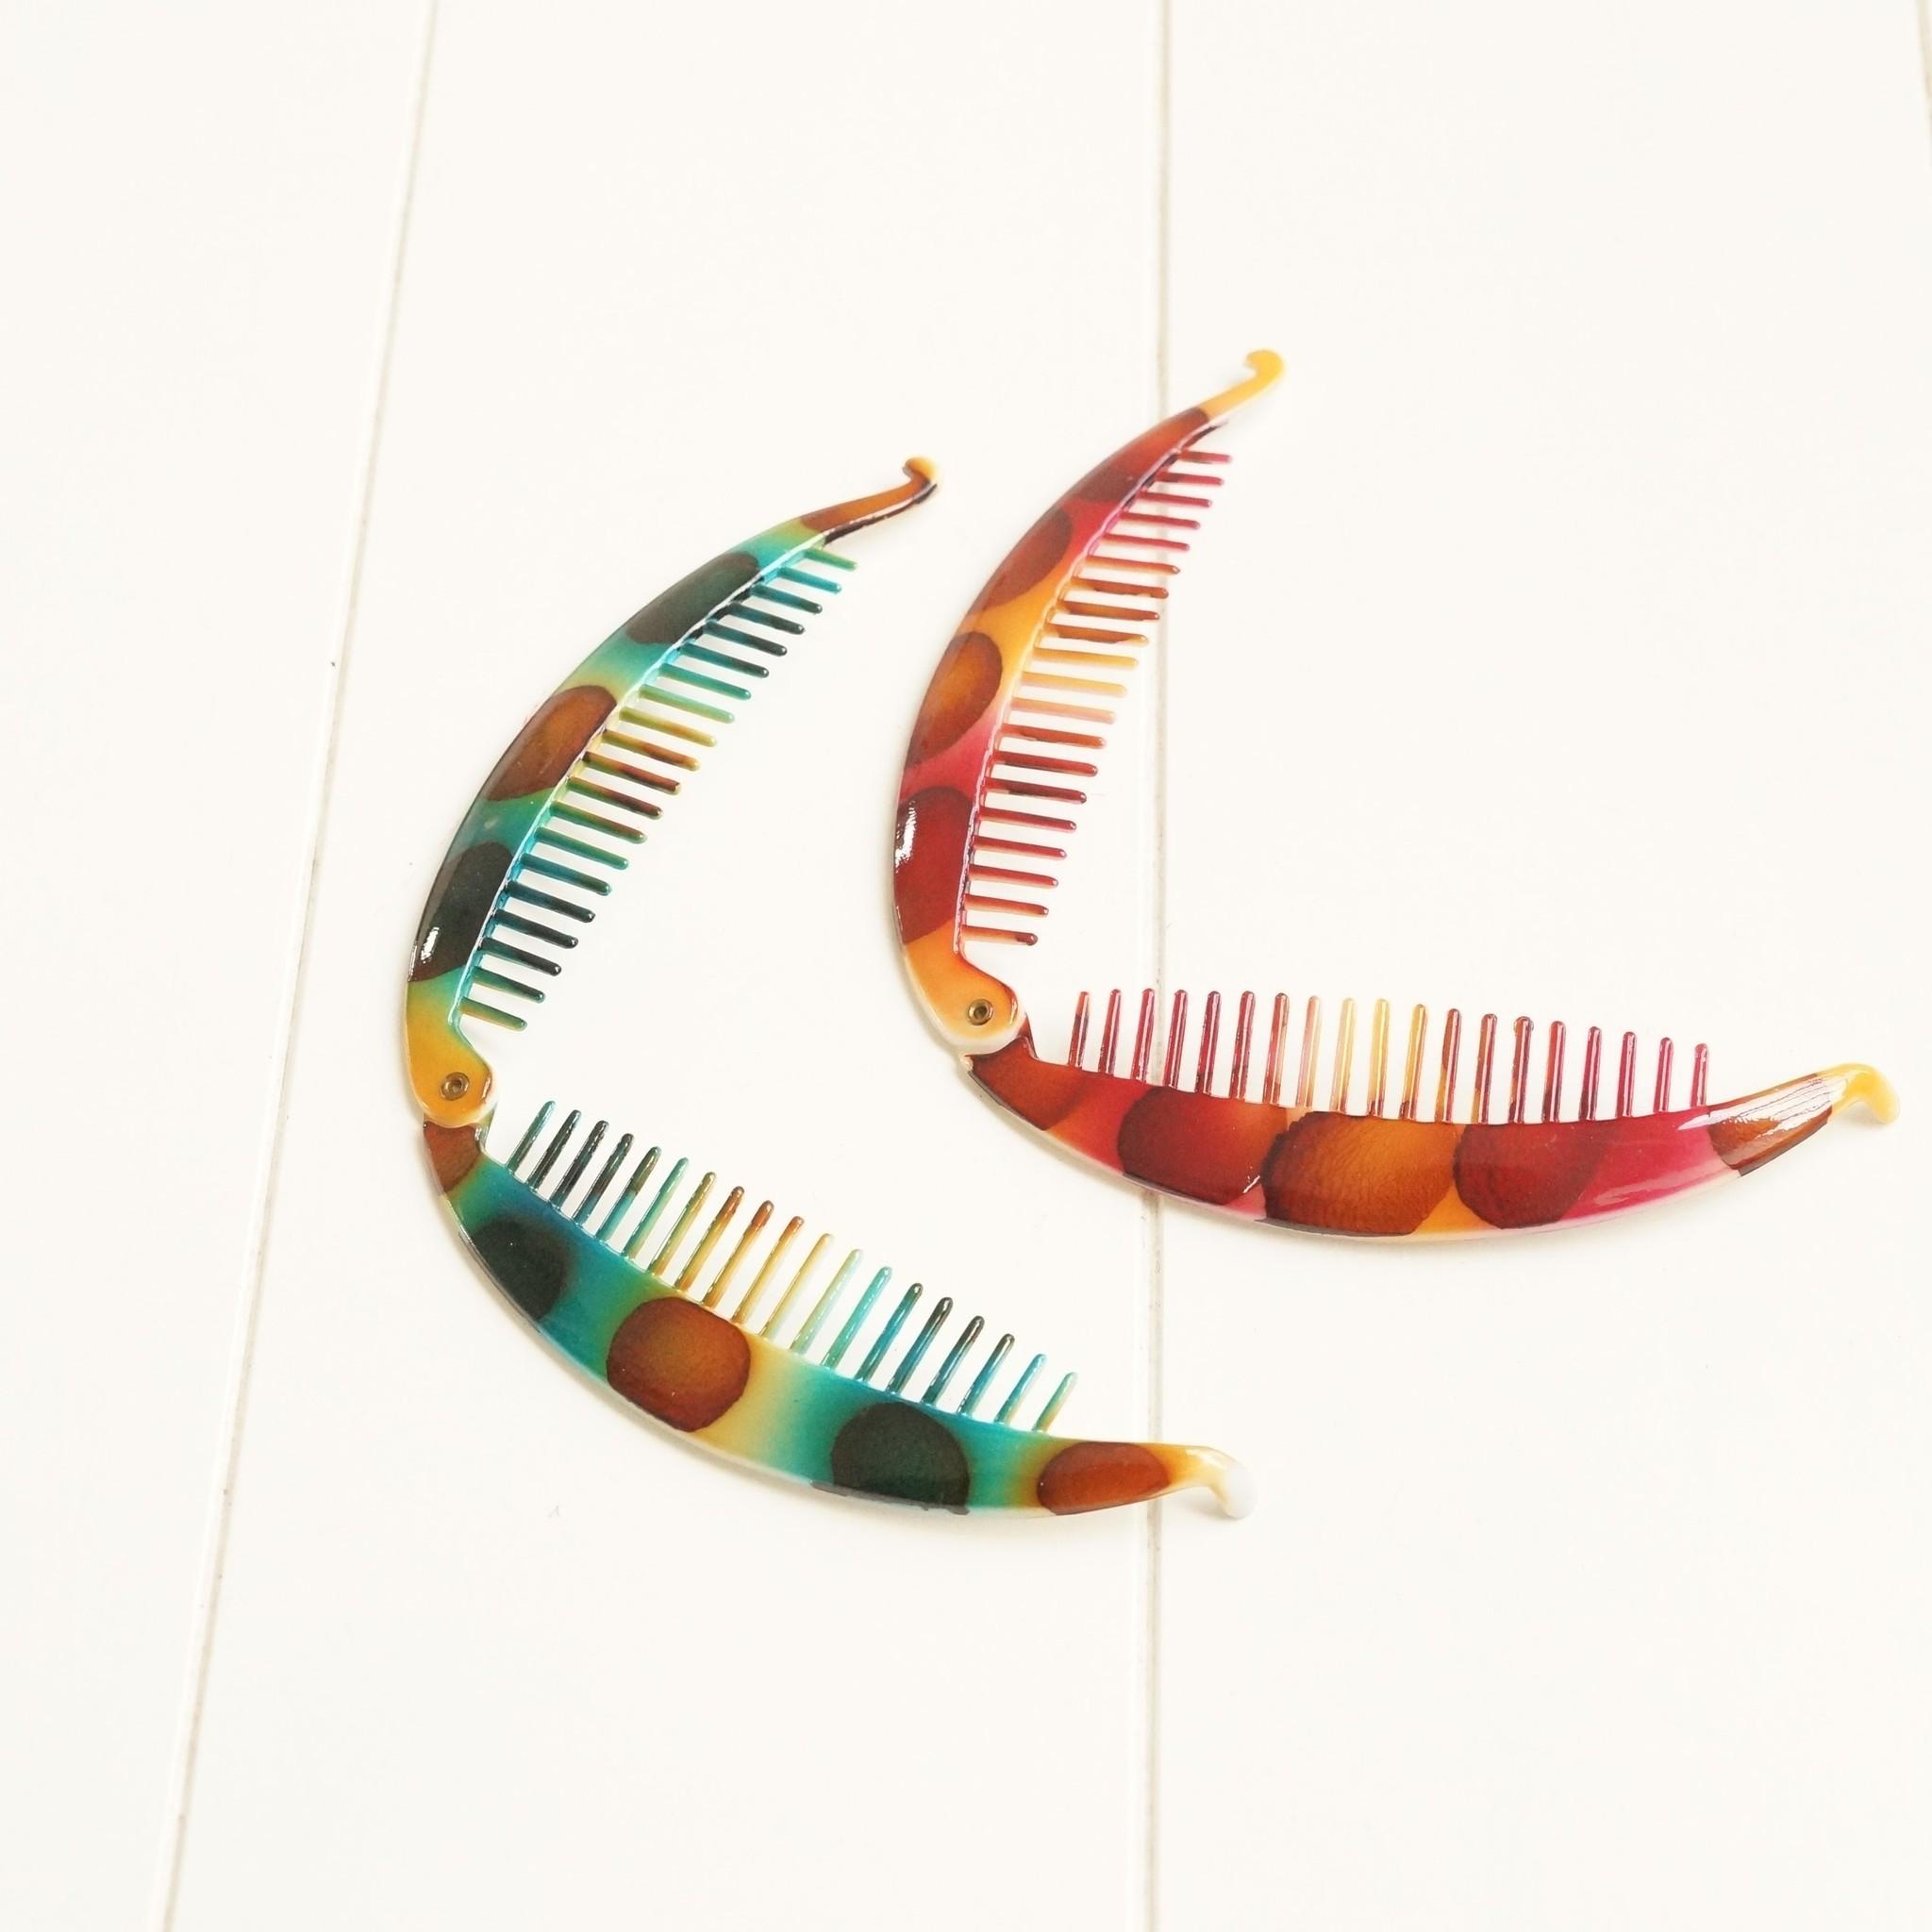 Gekleurde bananenklemmen (2X)